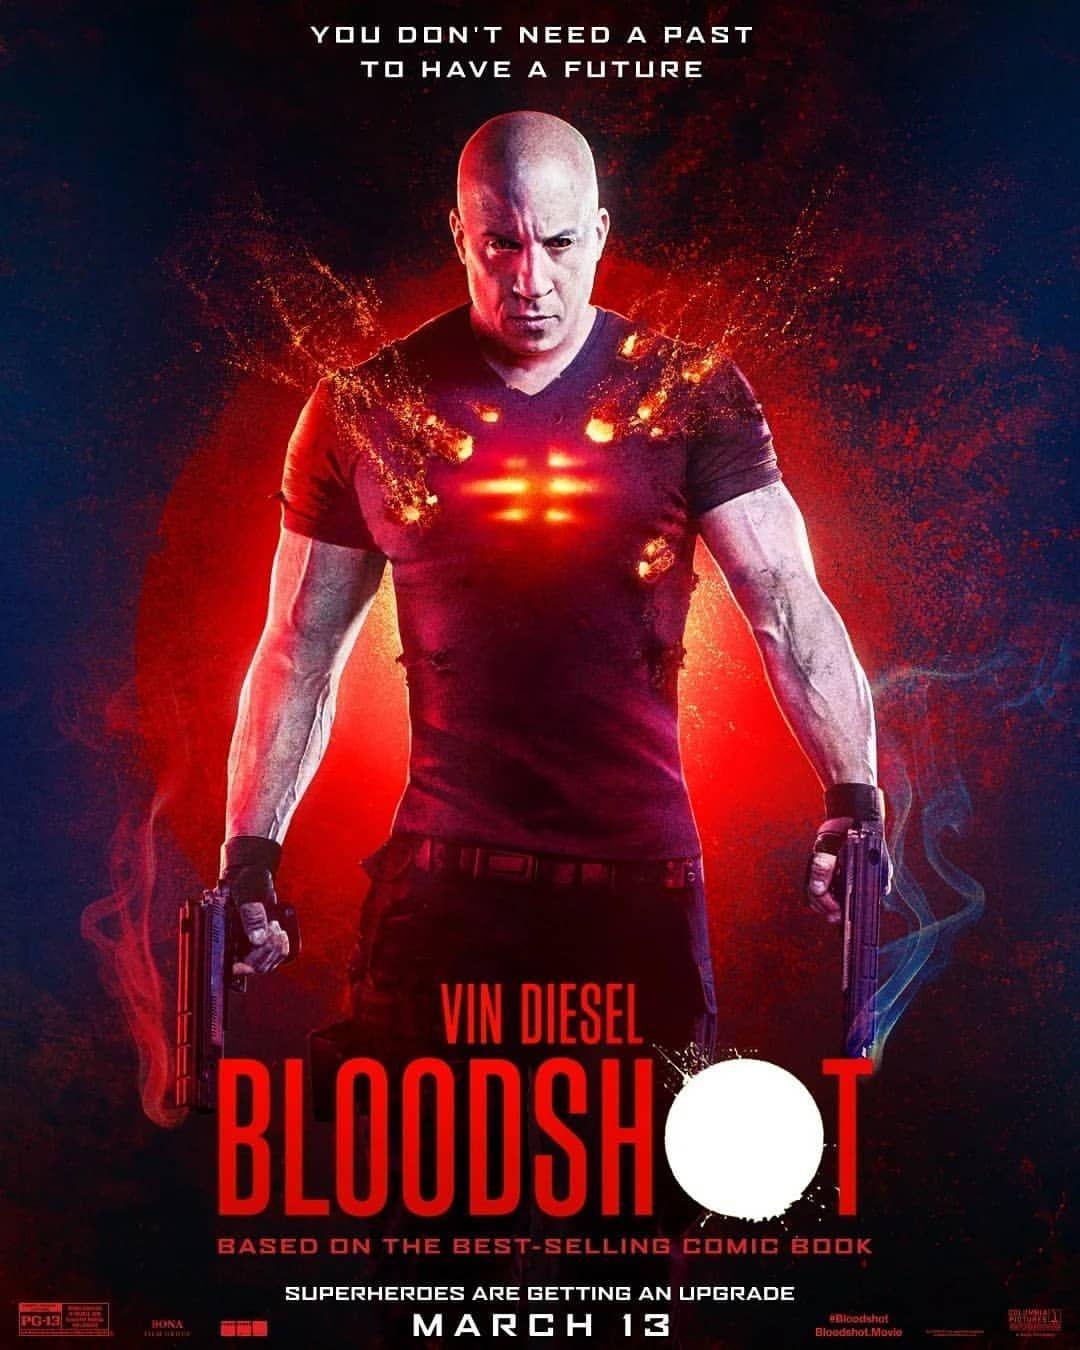 Bloodshot Filmes Completos Hindi Movies Baixar Filmes